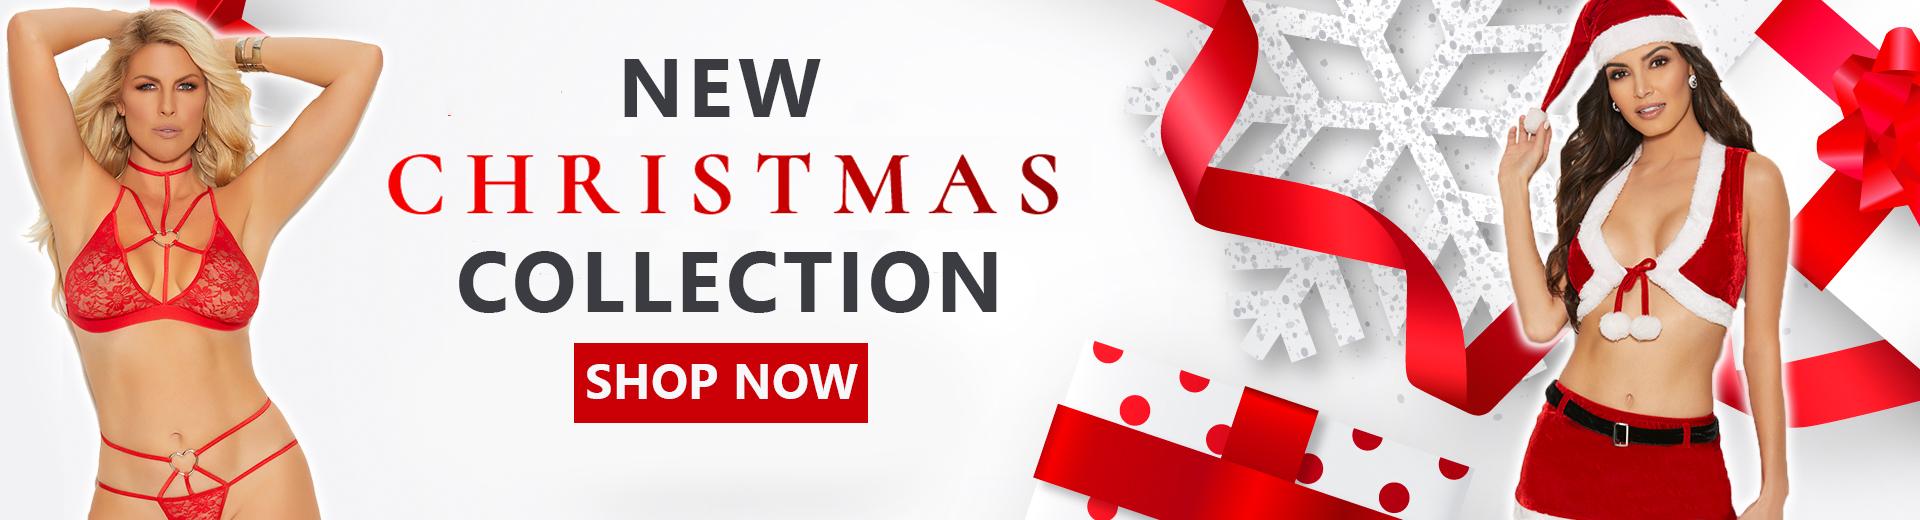 new Christmas lingerie 2019 mystrippercloset